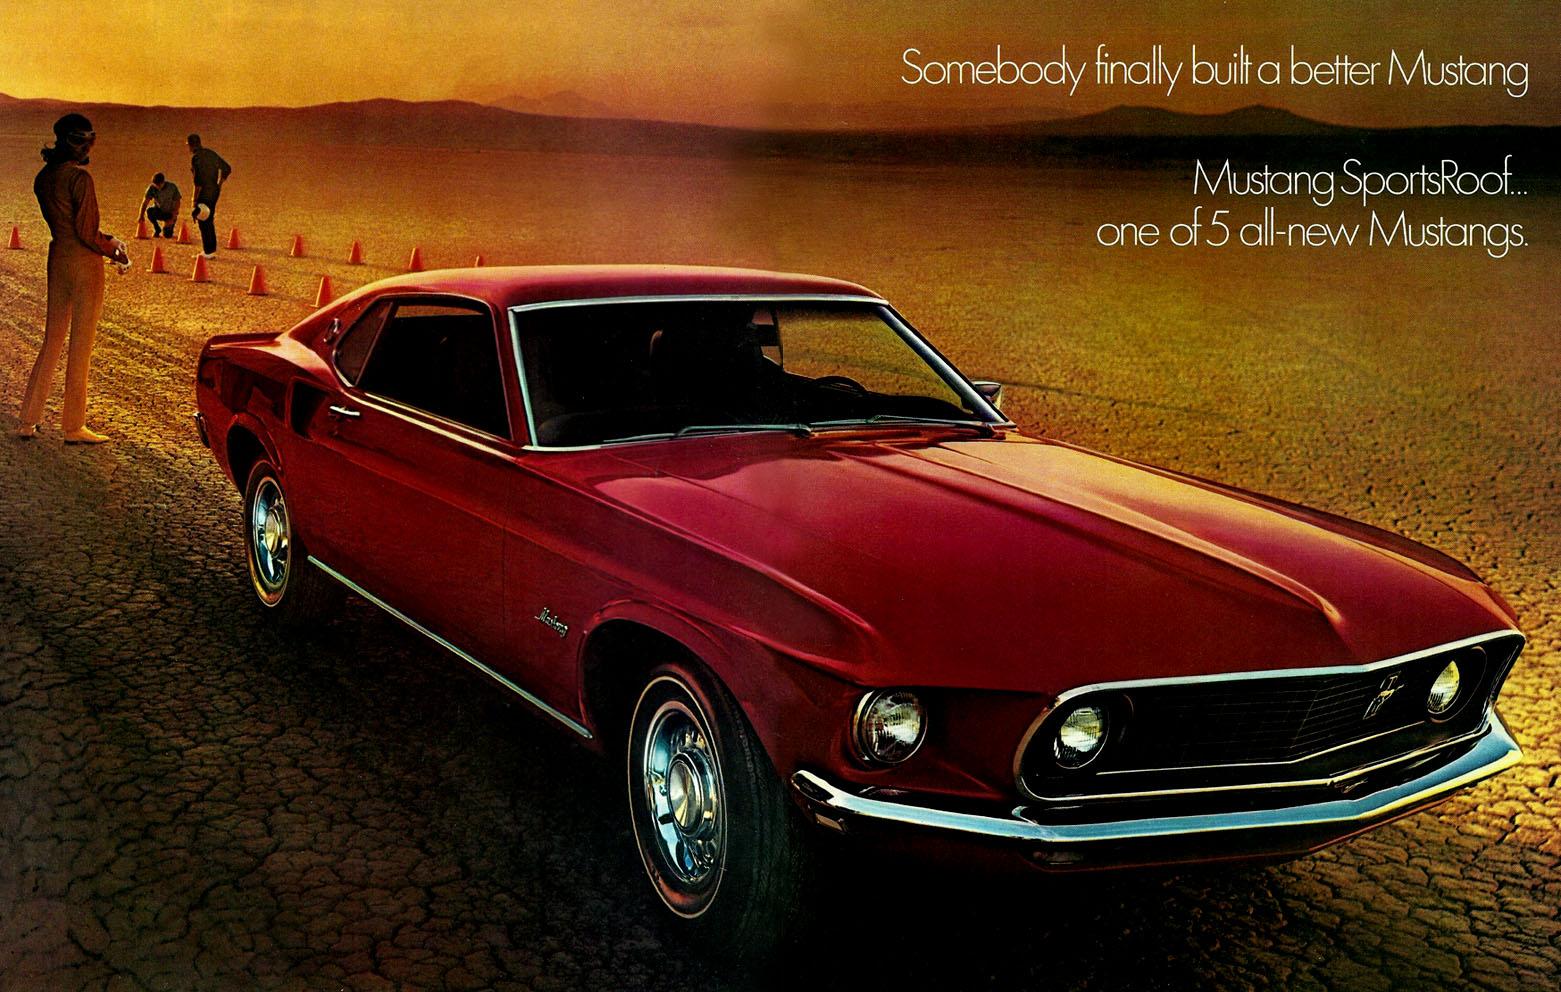 1969 Mustang sportsRoof